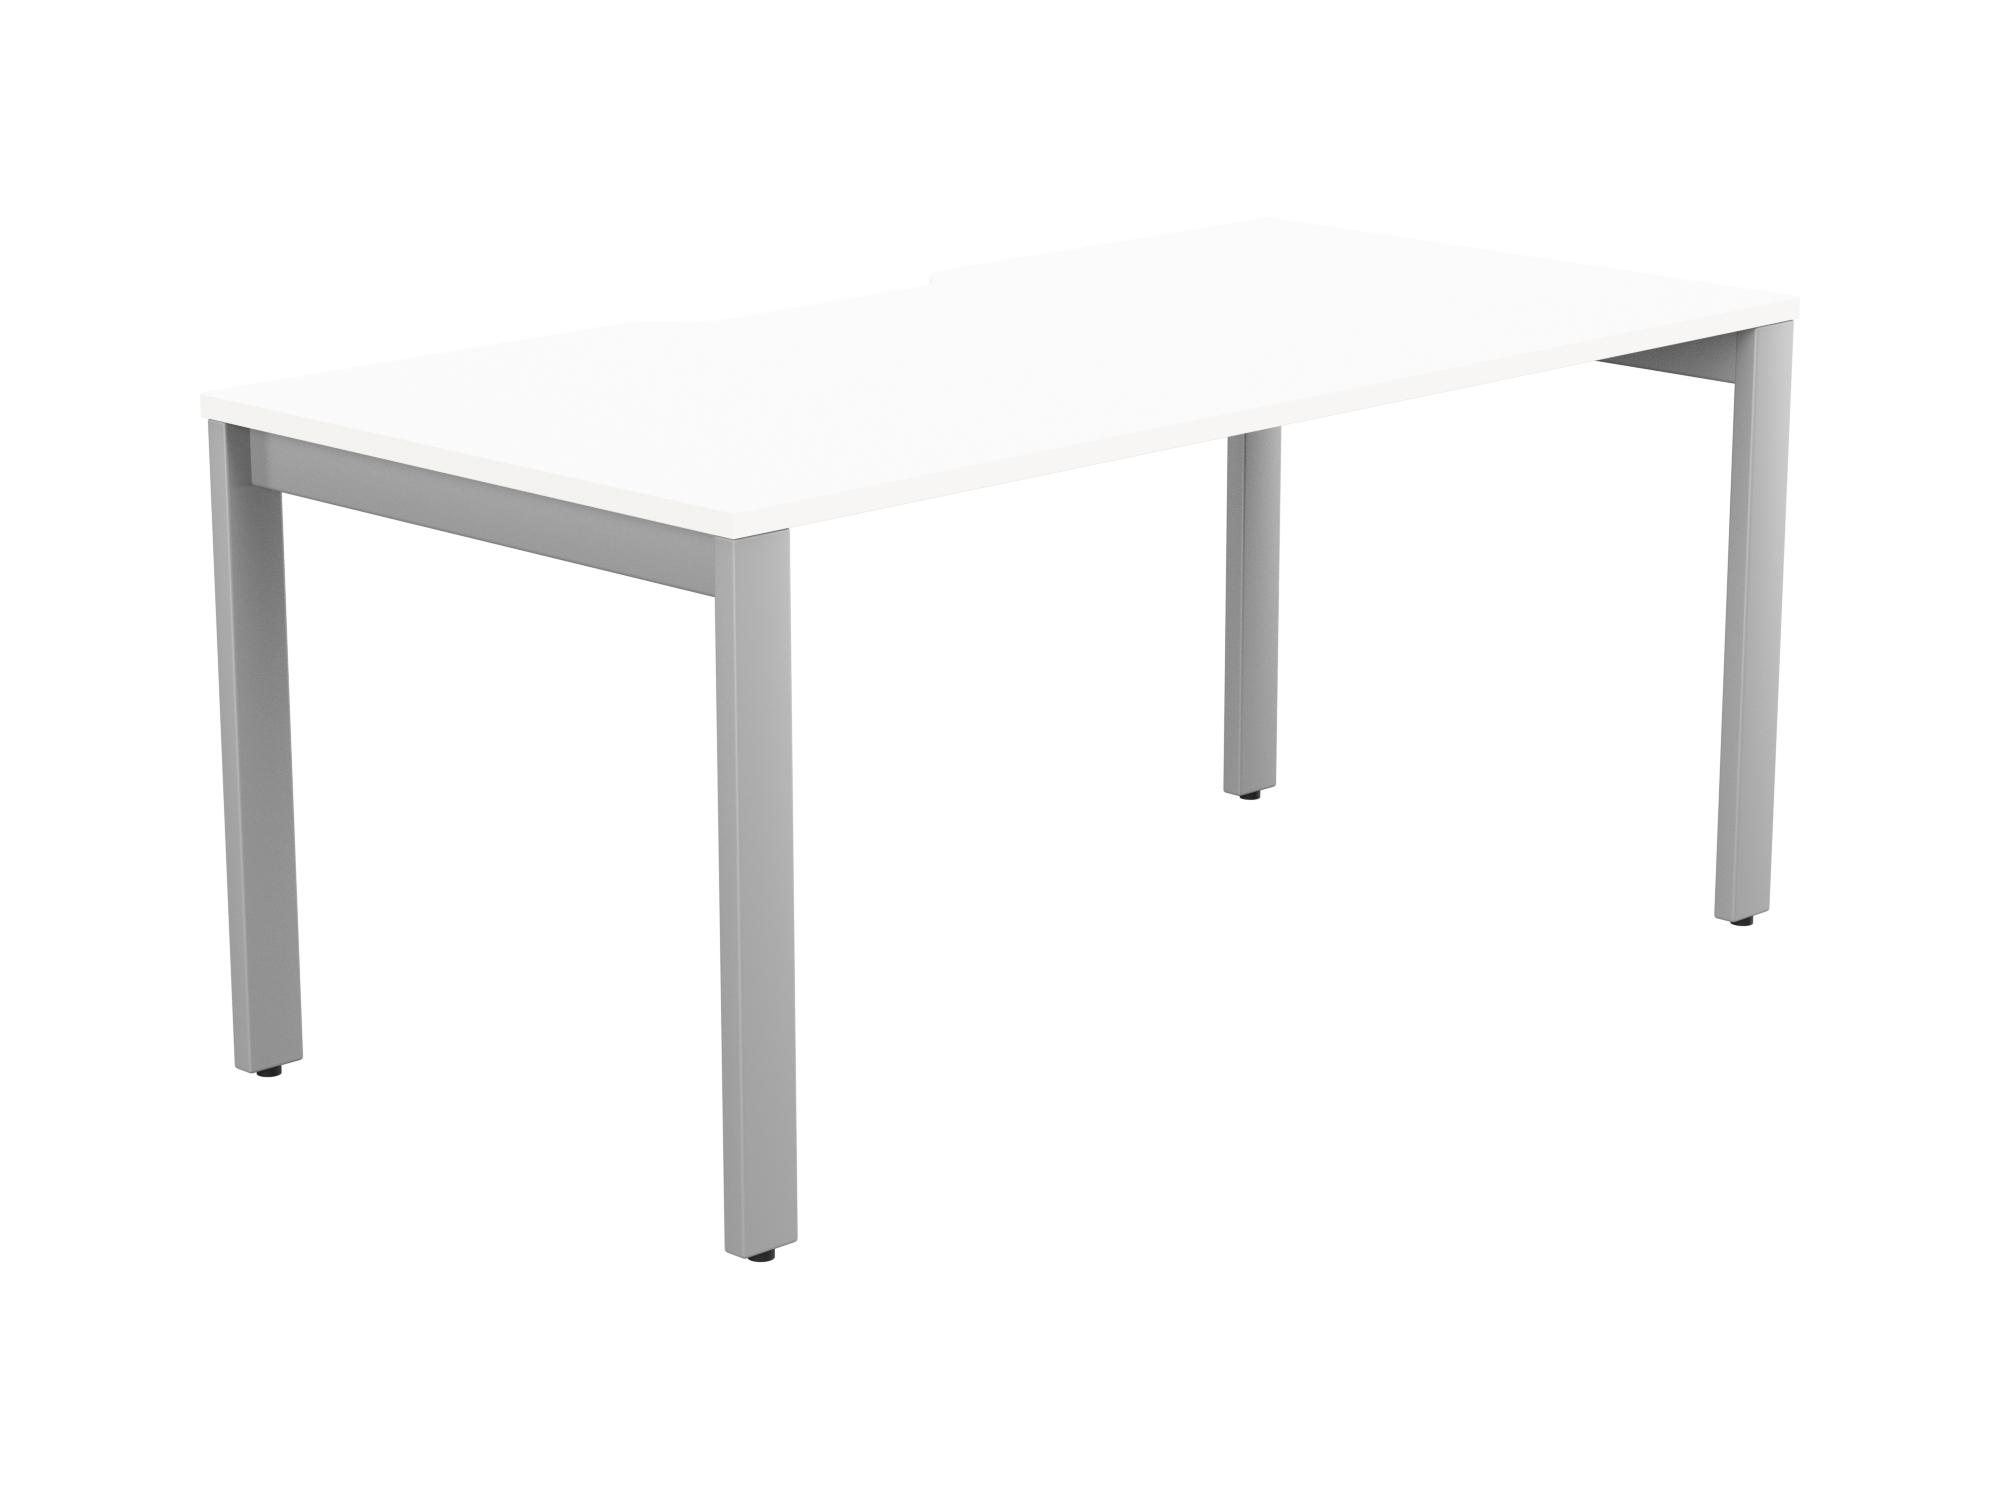 Switch 1 Person Bench Open Leg Scallop Top 1600 x 800 - Silver Frame / White Top